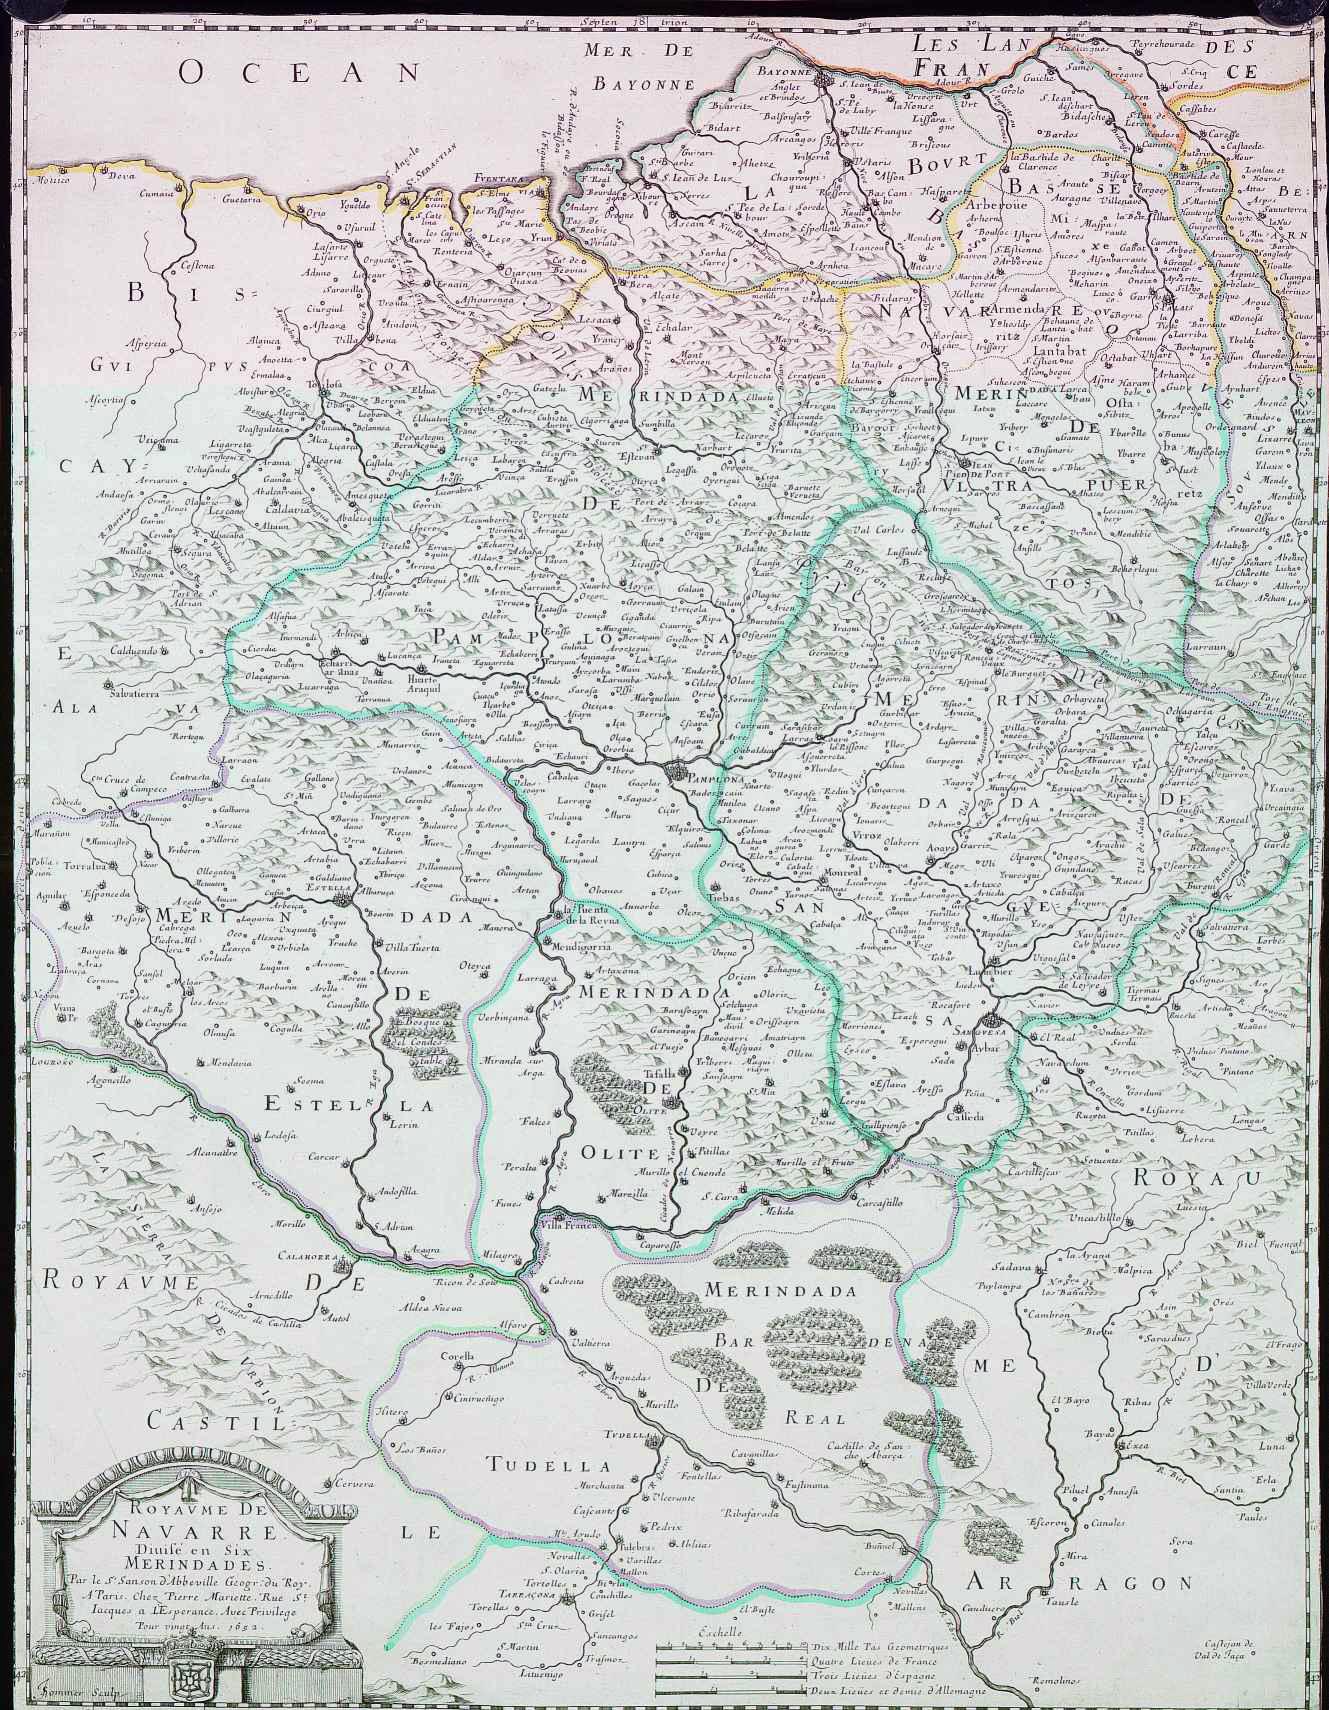 Mapa de Reino de Navarra en seis Merindades